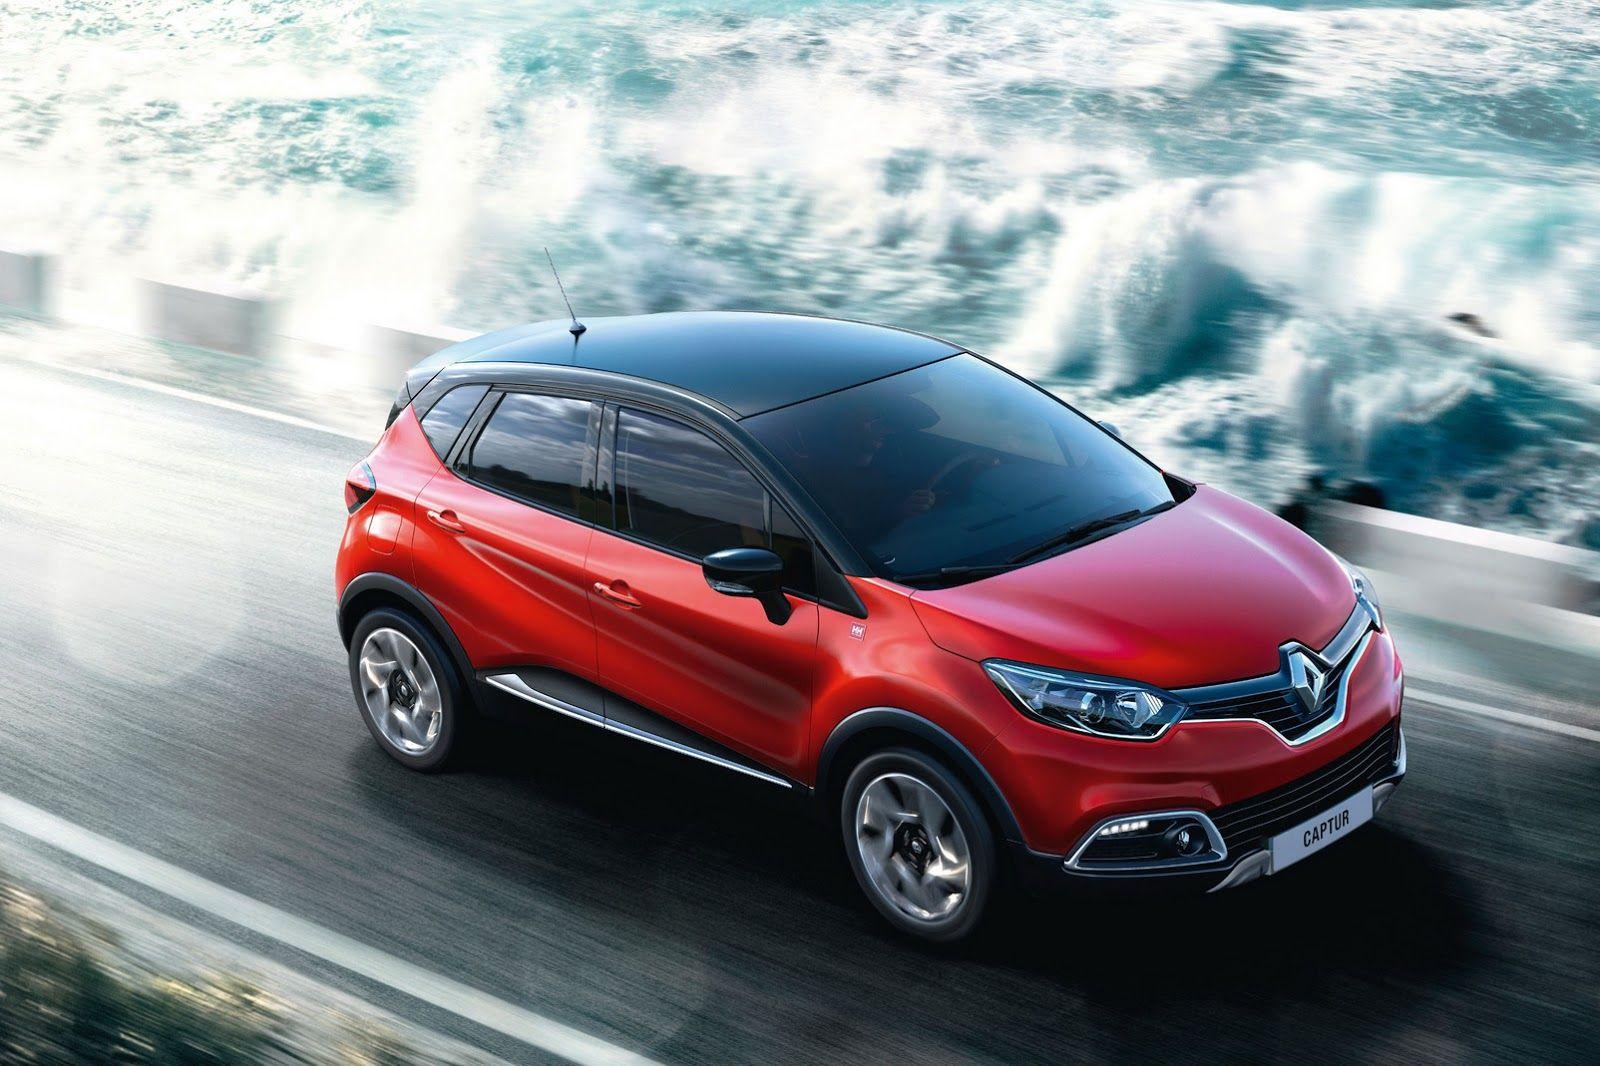 New Signature Model Takes Top Spot in Renault Captur's UK